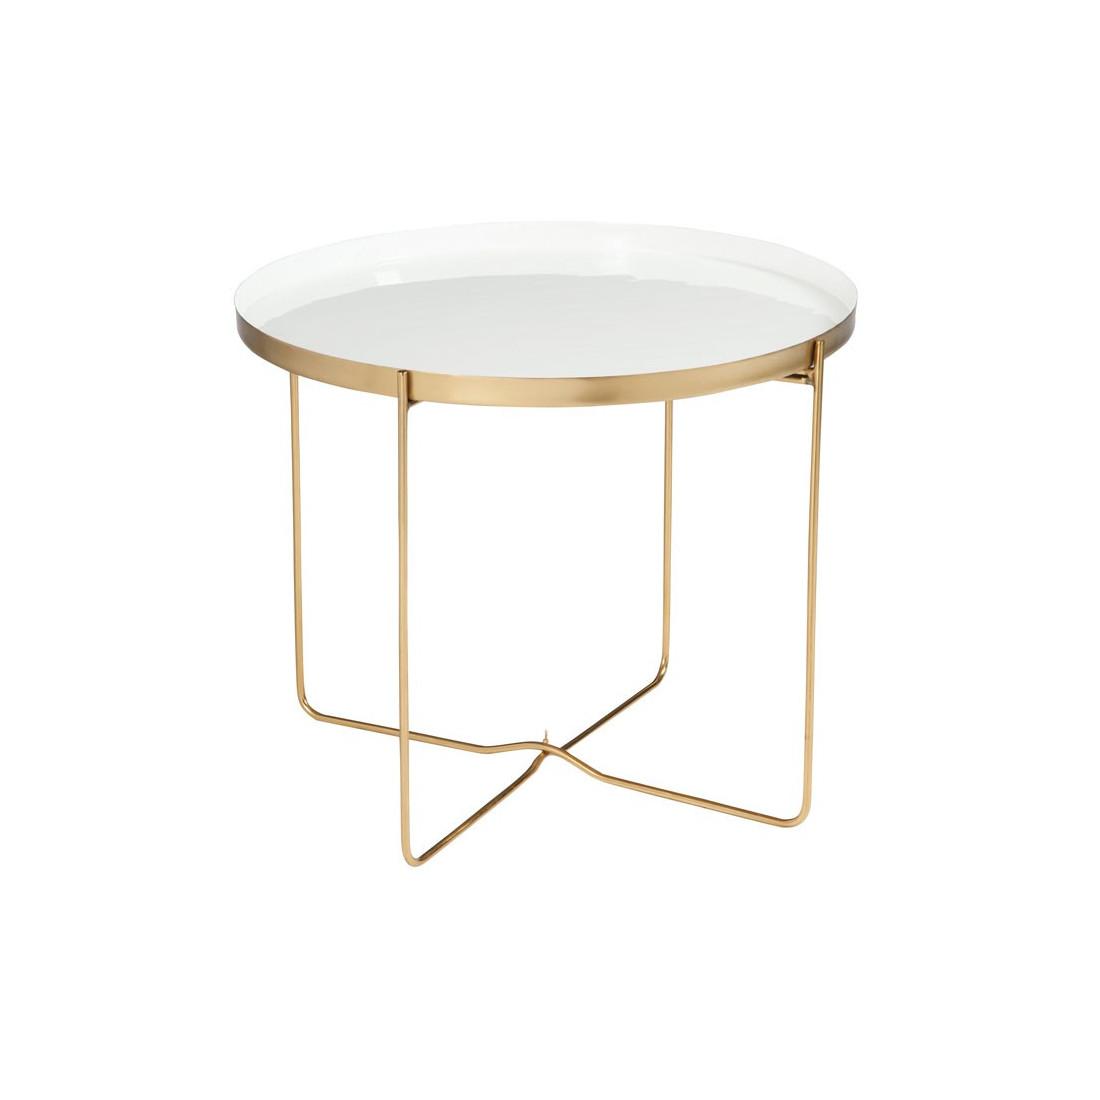 table d 39 appoint m tal or blanc bisco univers des petits. Black Bedroom Furniture Sets. Home Design Ideas